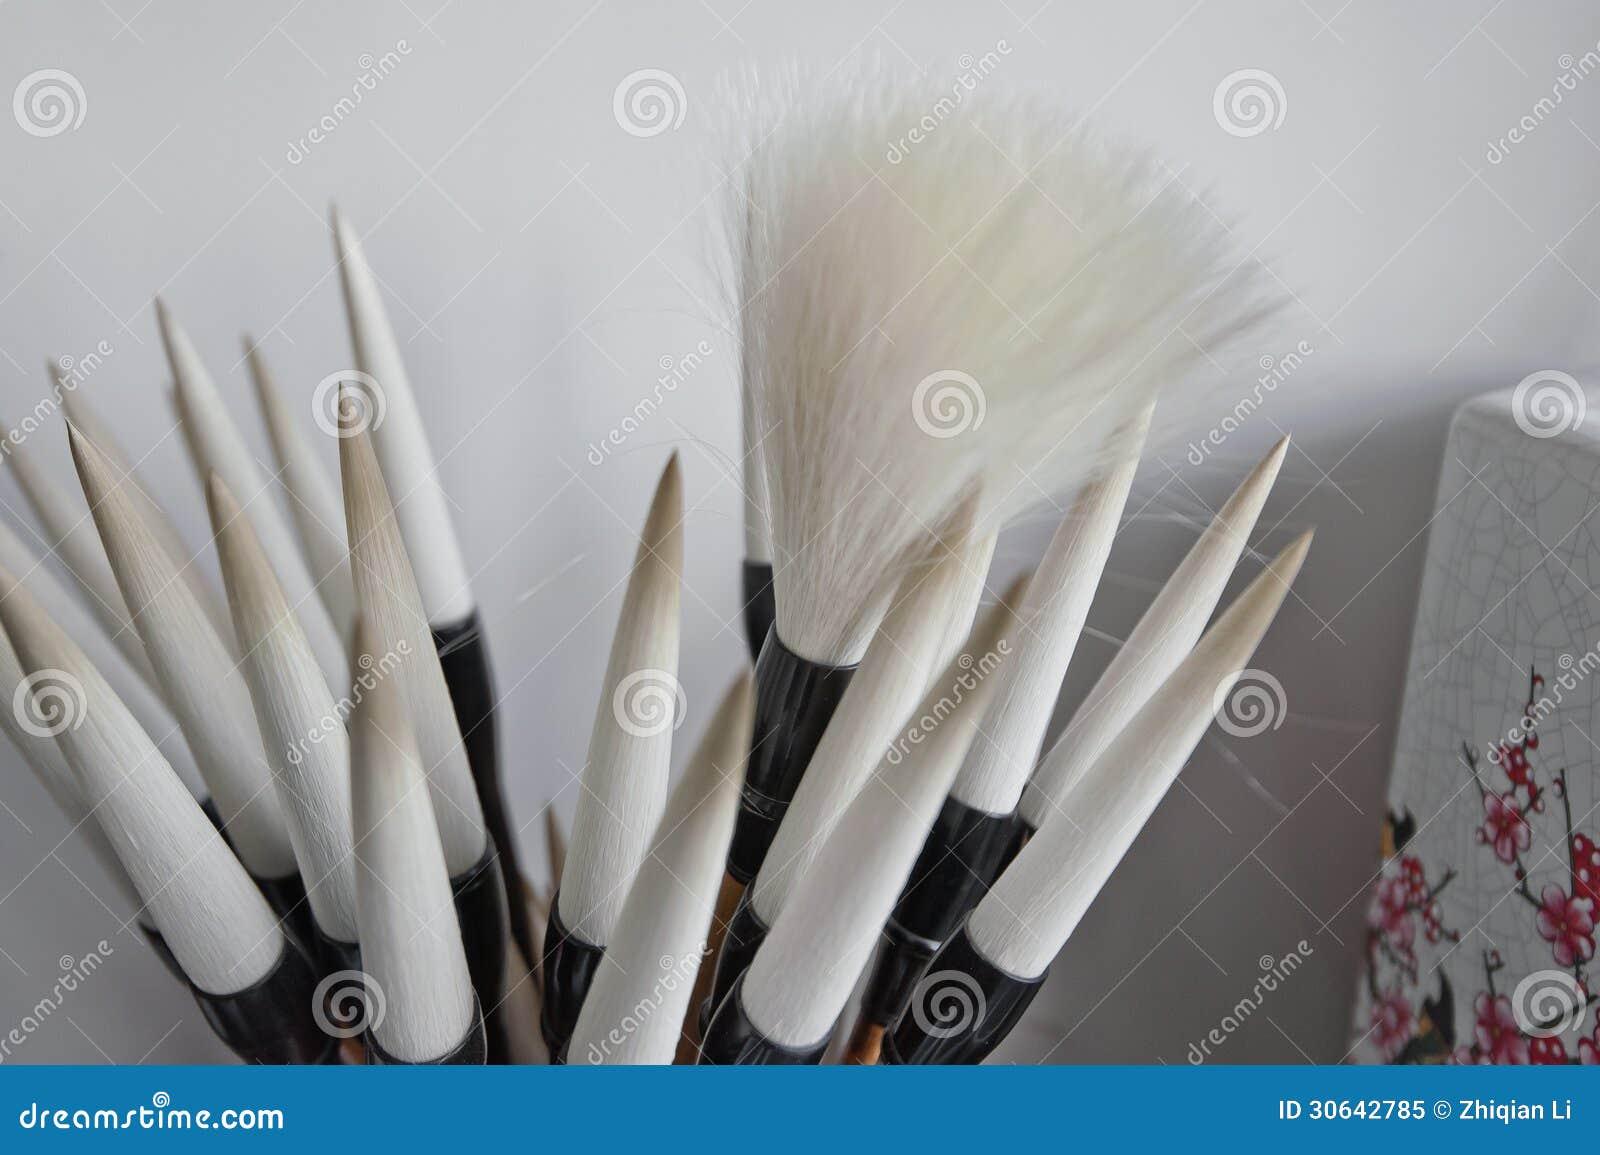 Chinese writing brushes